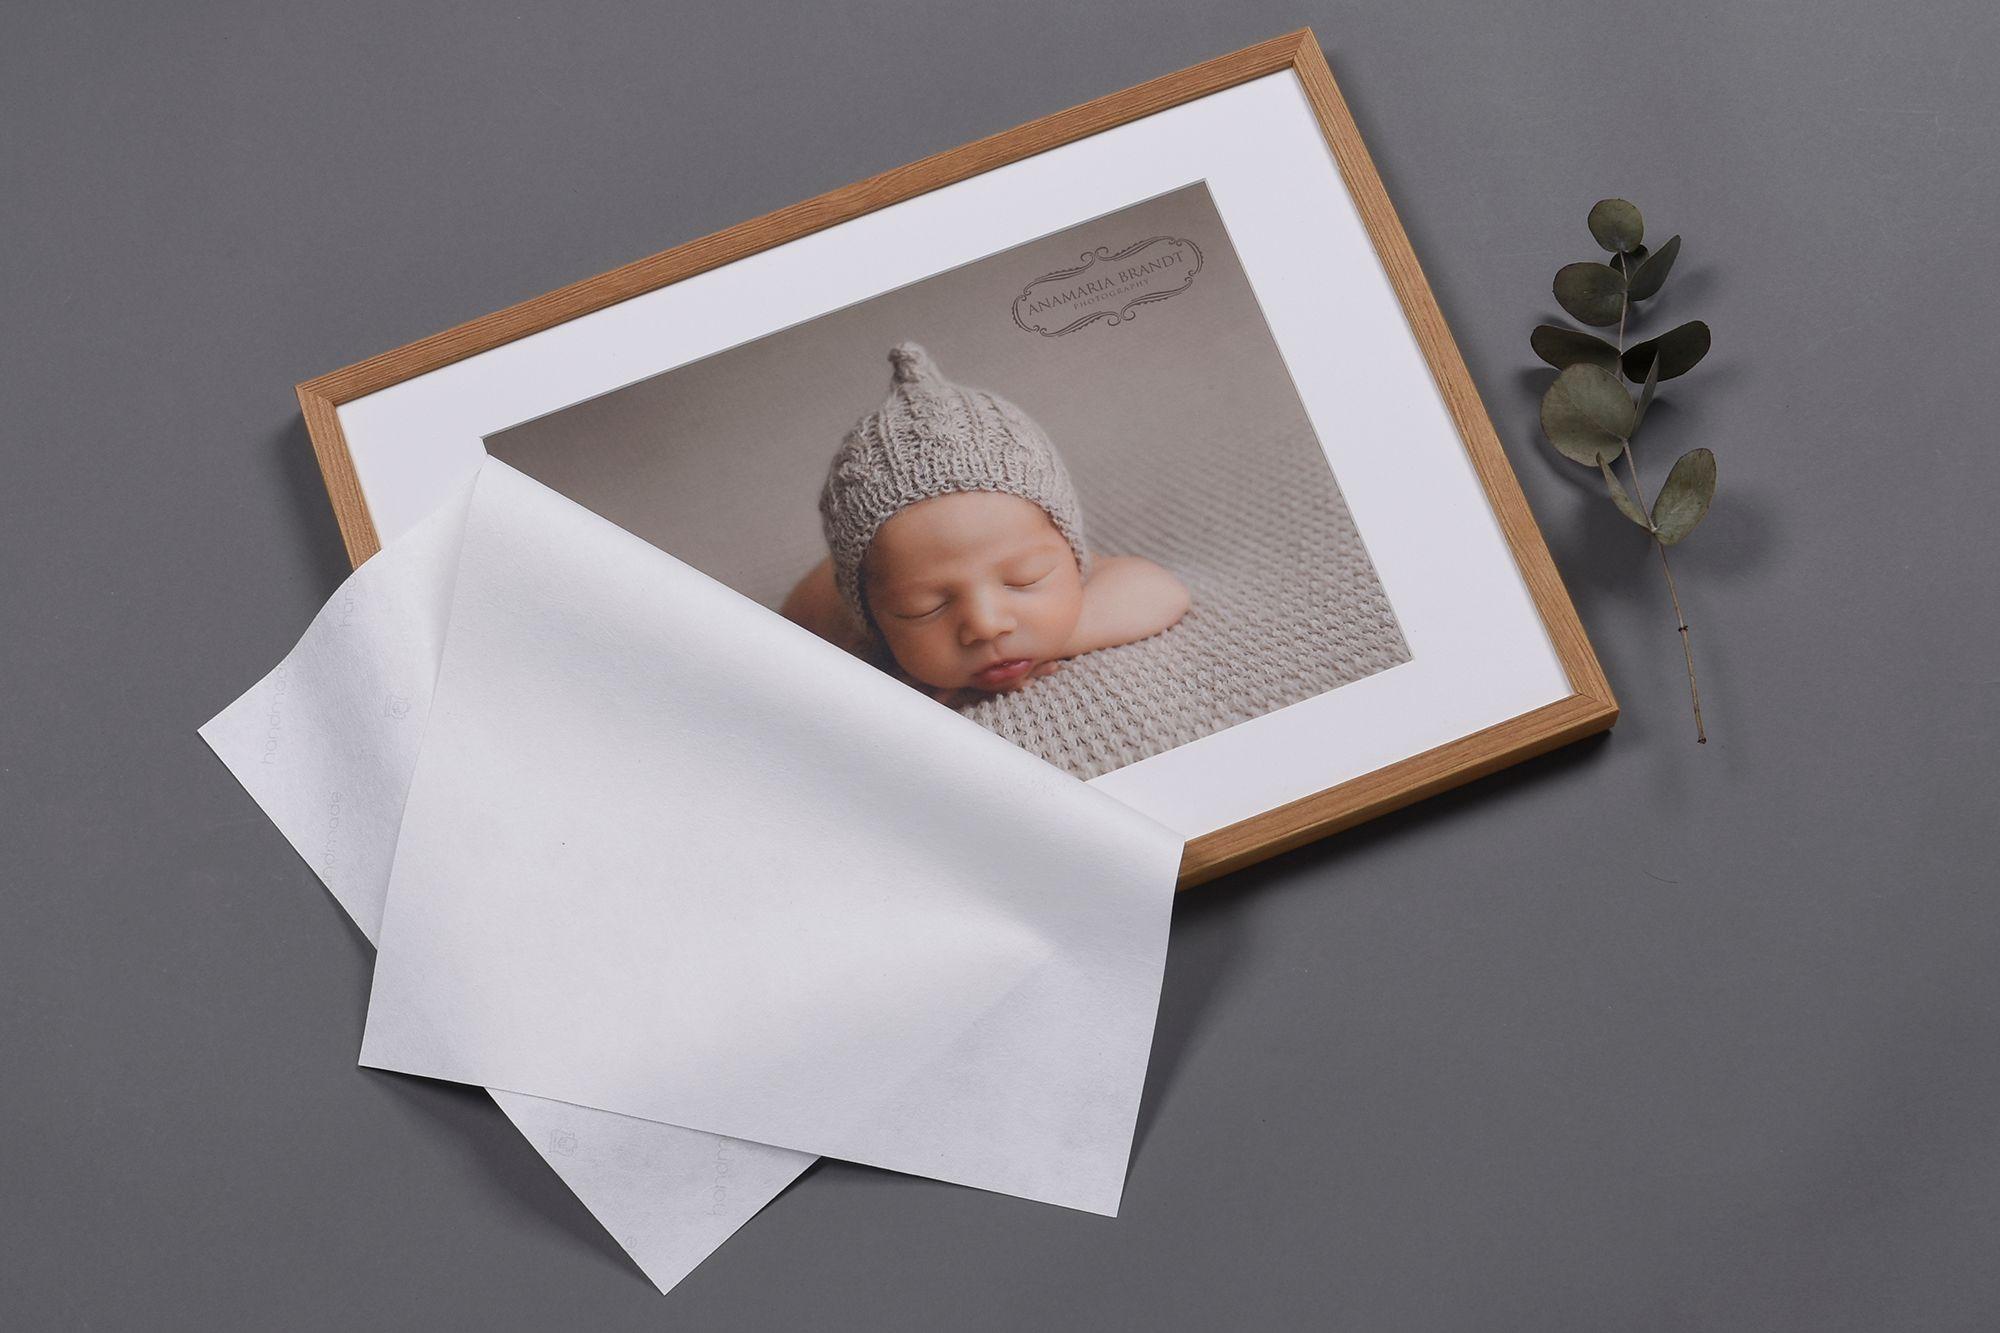 Framed Professional Newborn Print by Ana Brandt Photography